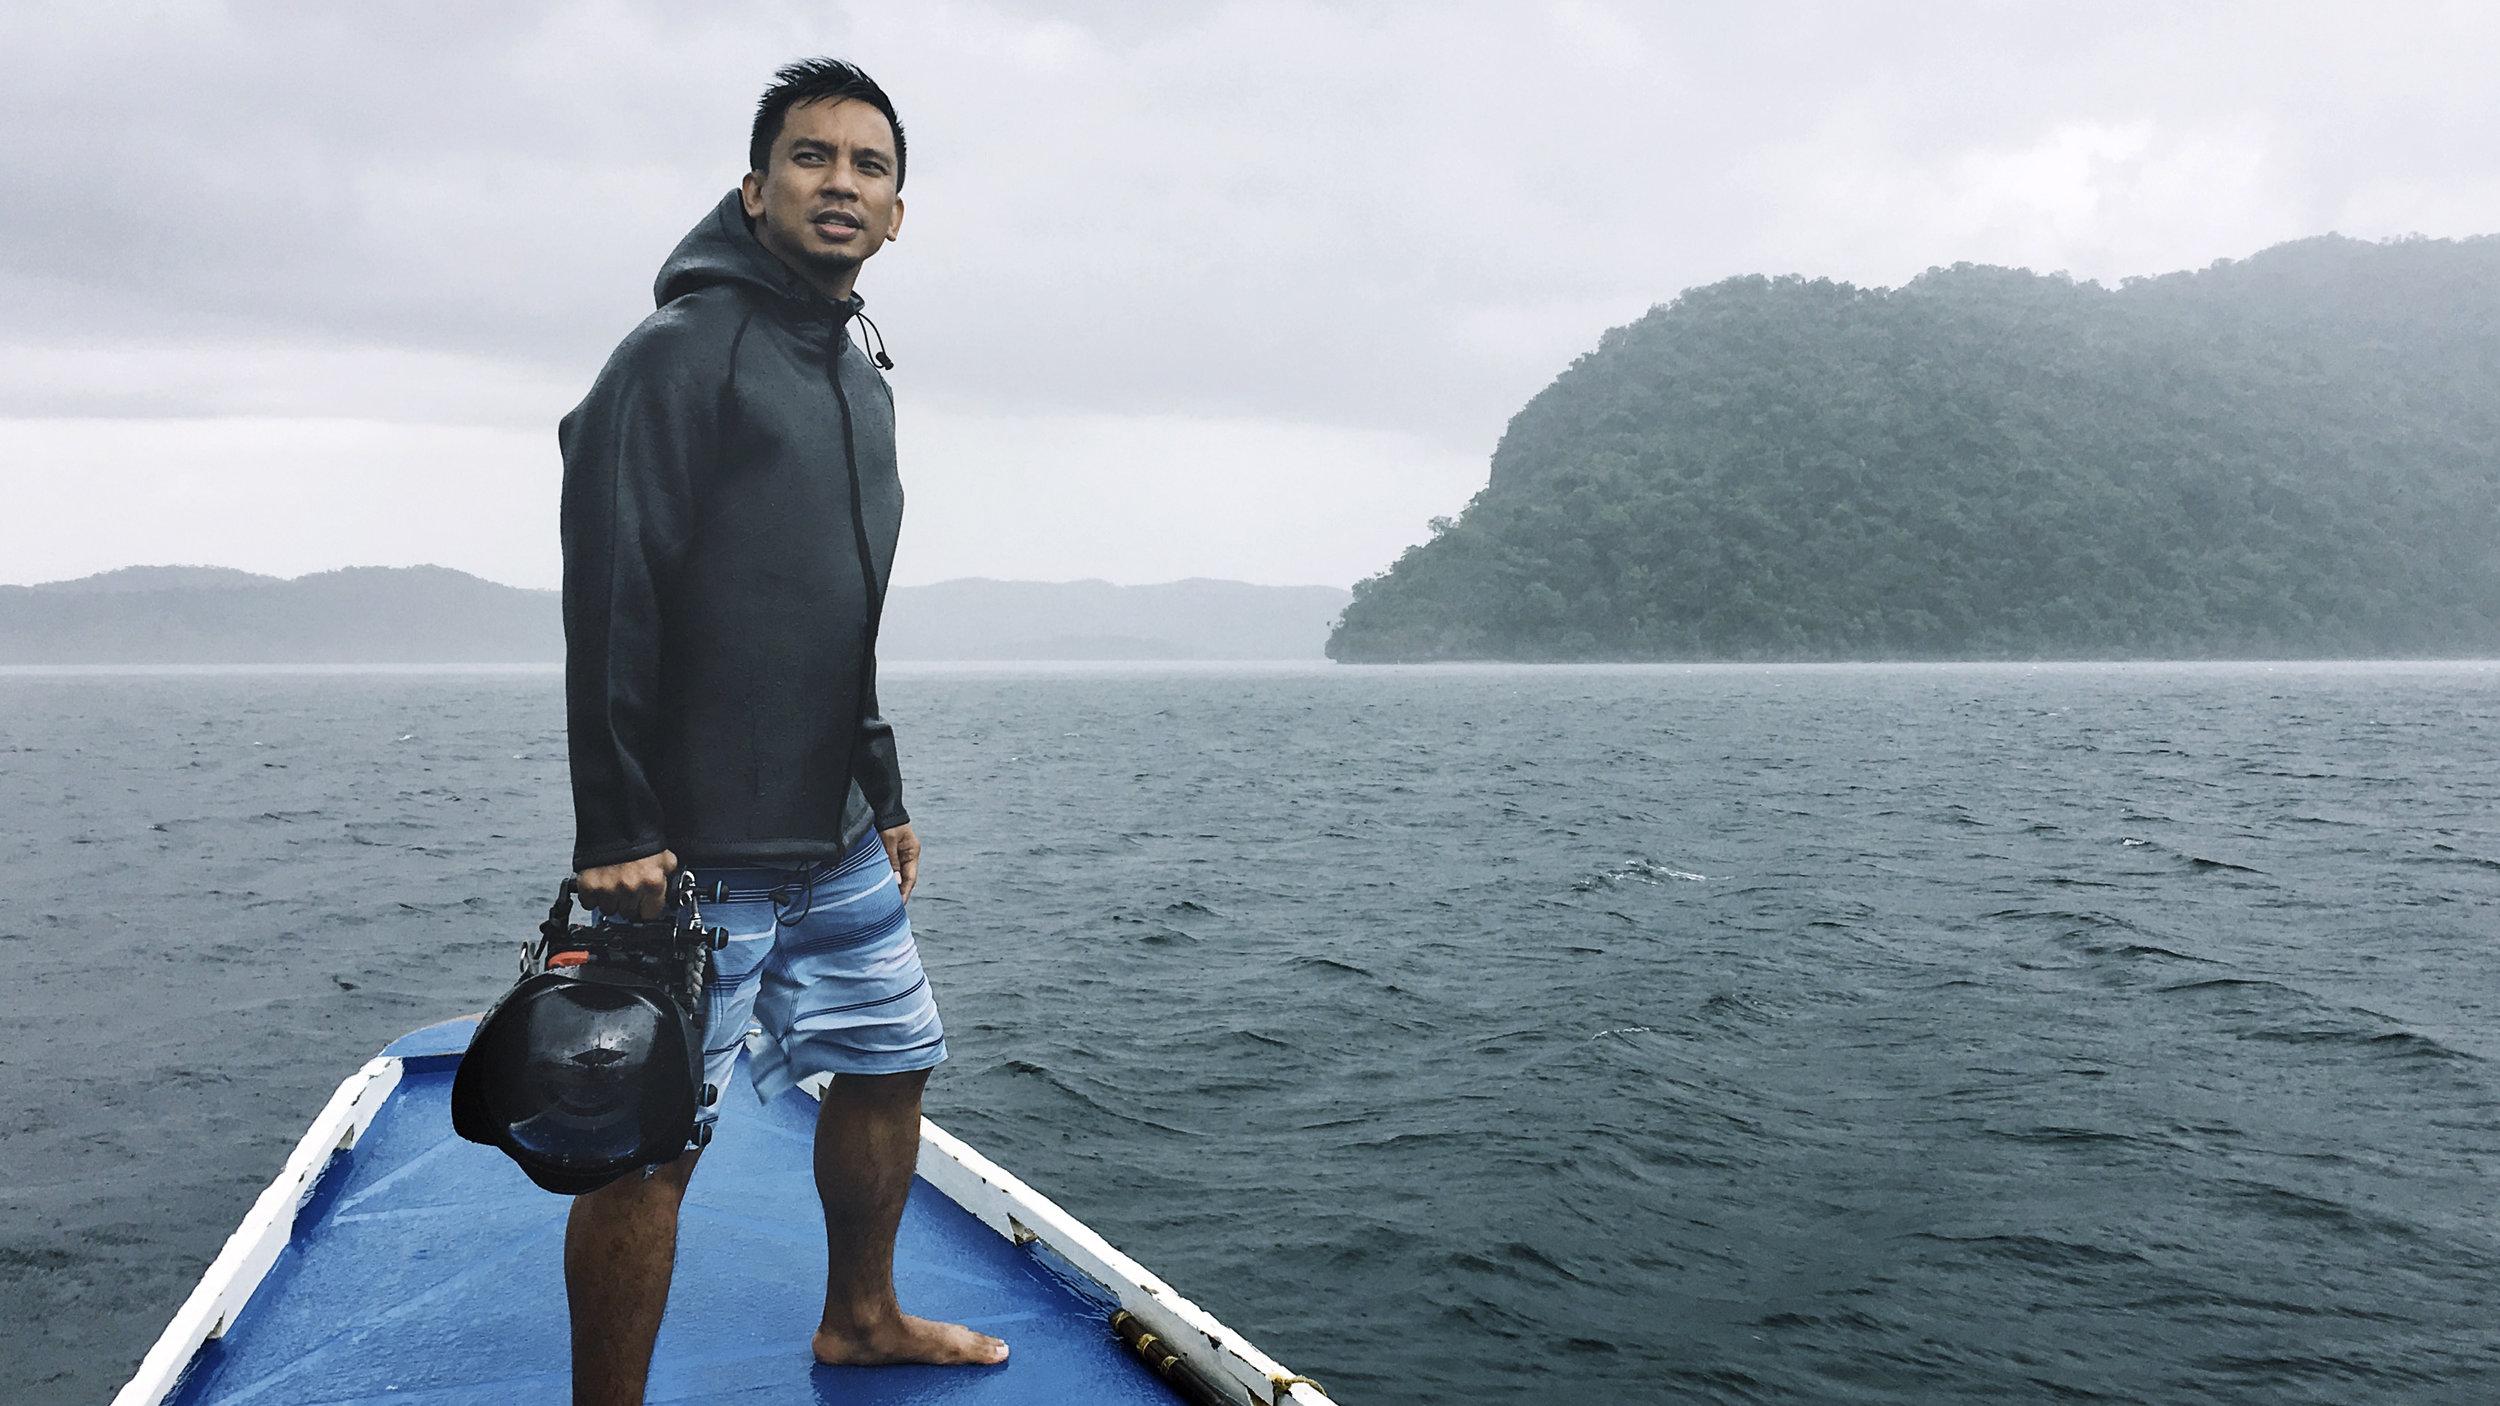 22º Brand Ambassador Noel Guevara wearing his ocean jacket on photo assignment.